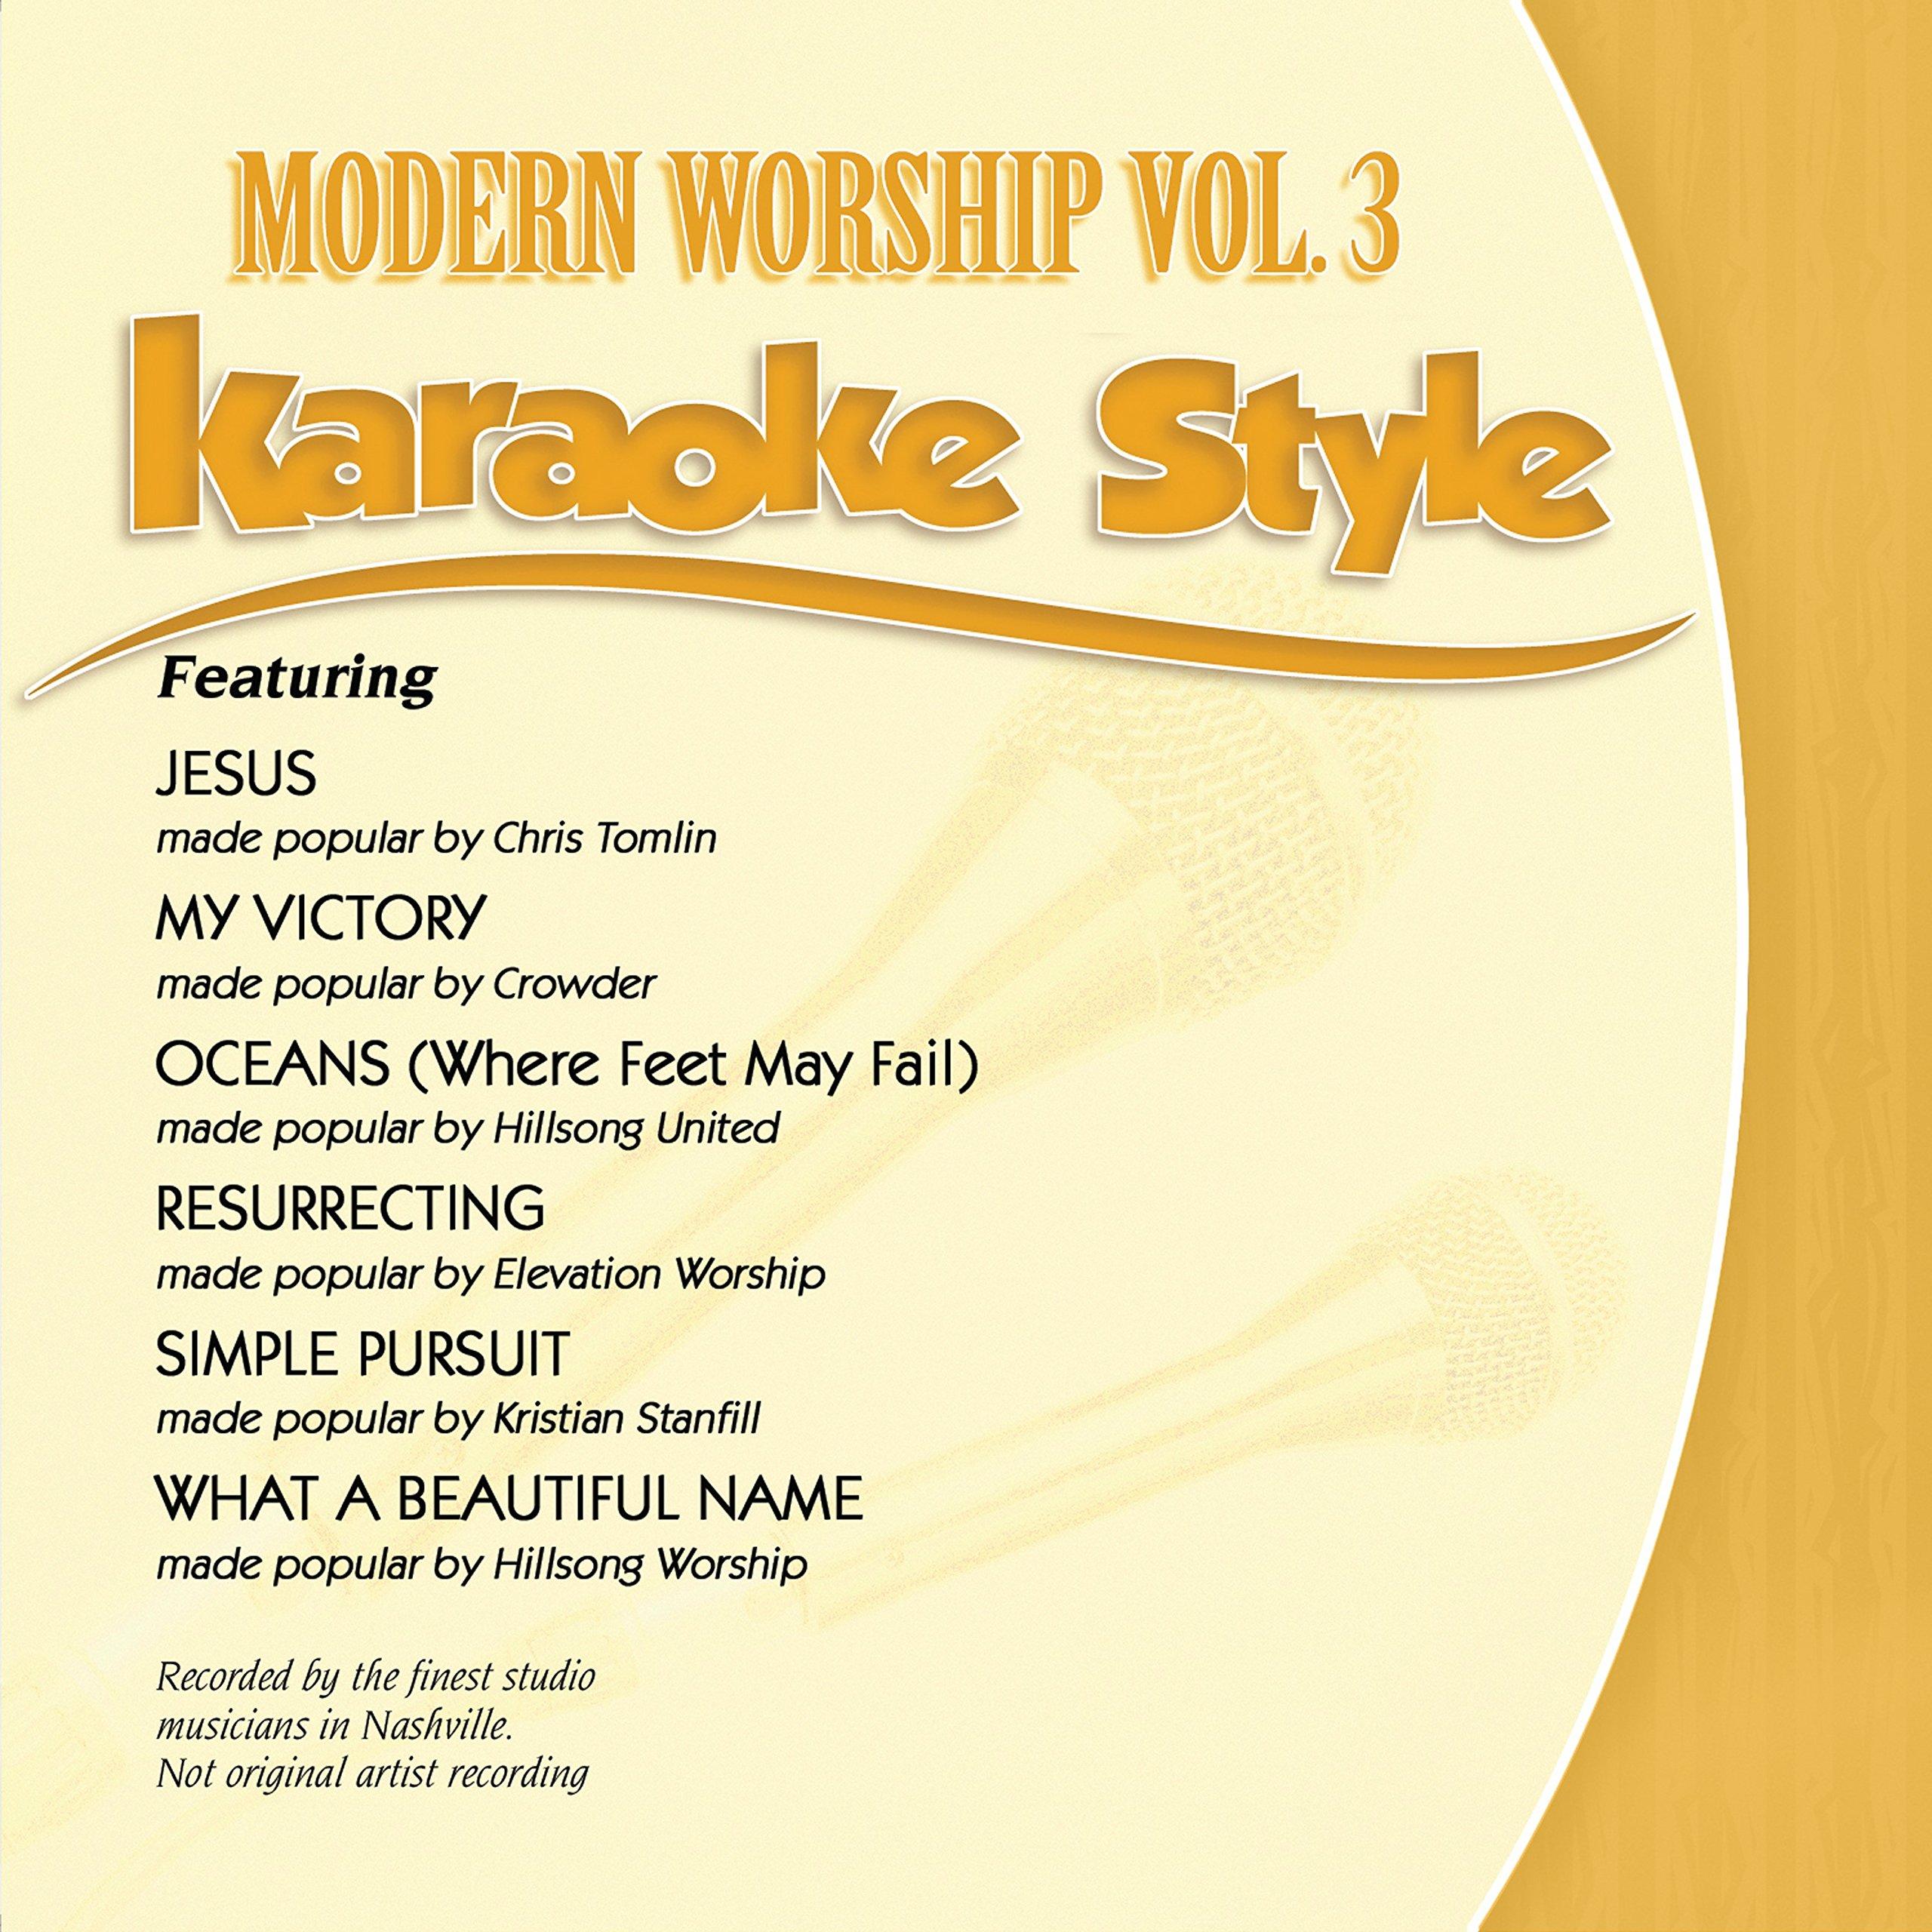 Karaoke Style: Modern Worship Vol. 3 by Daywind